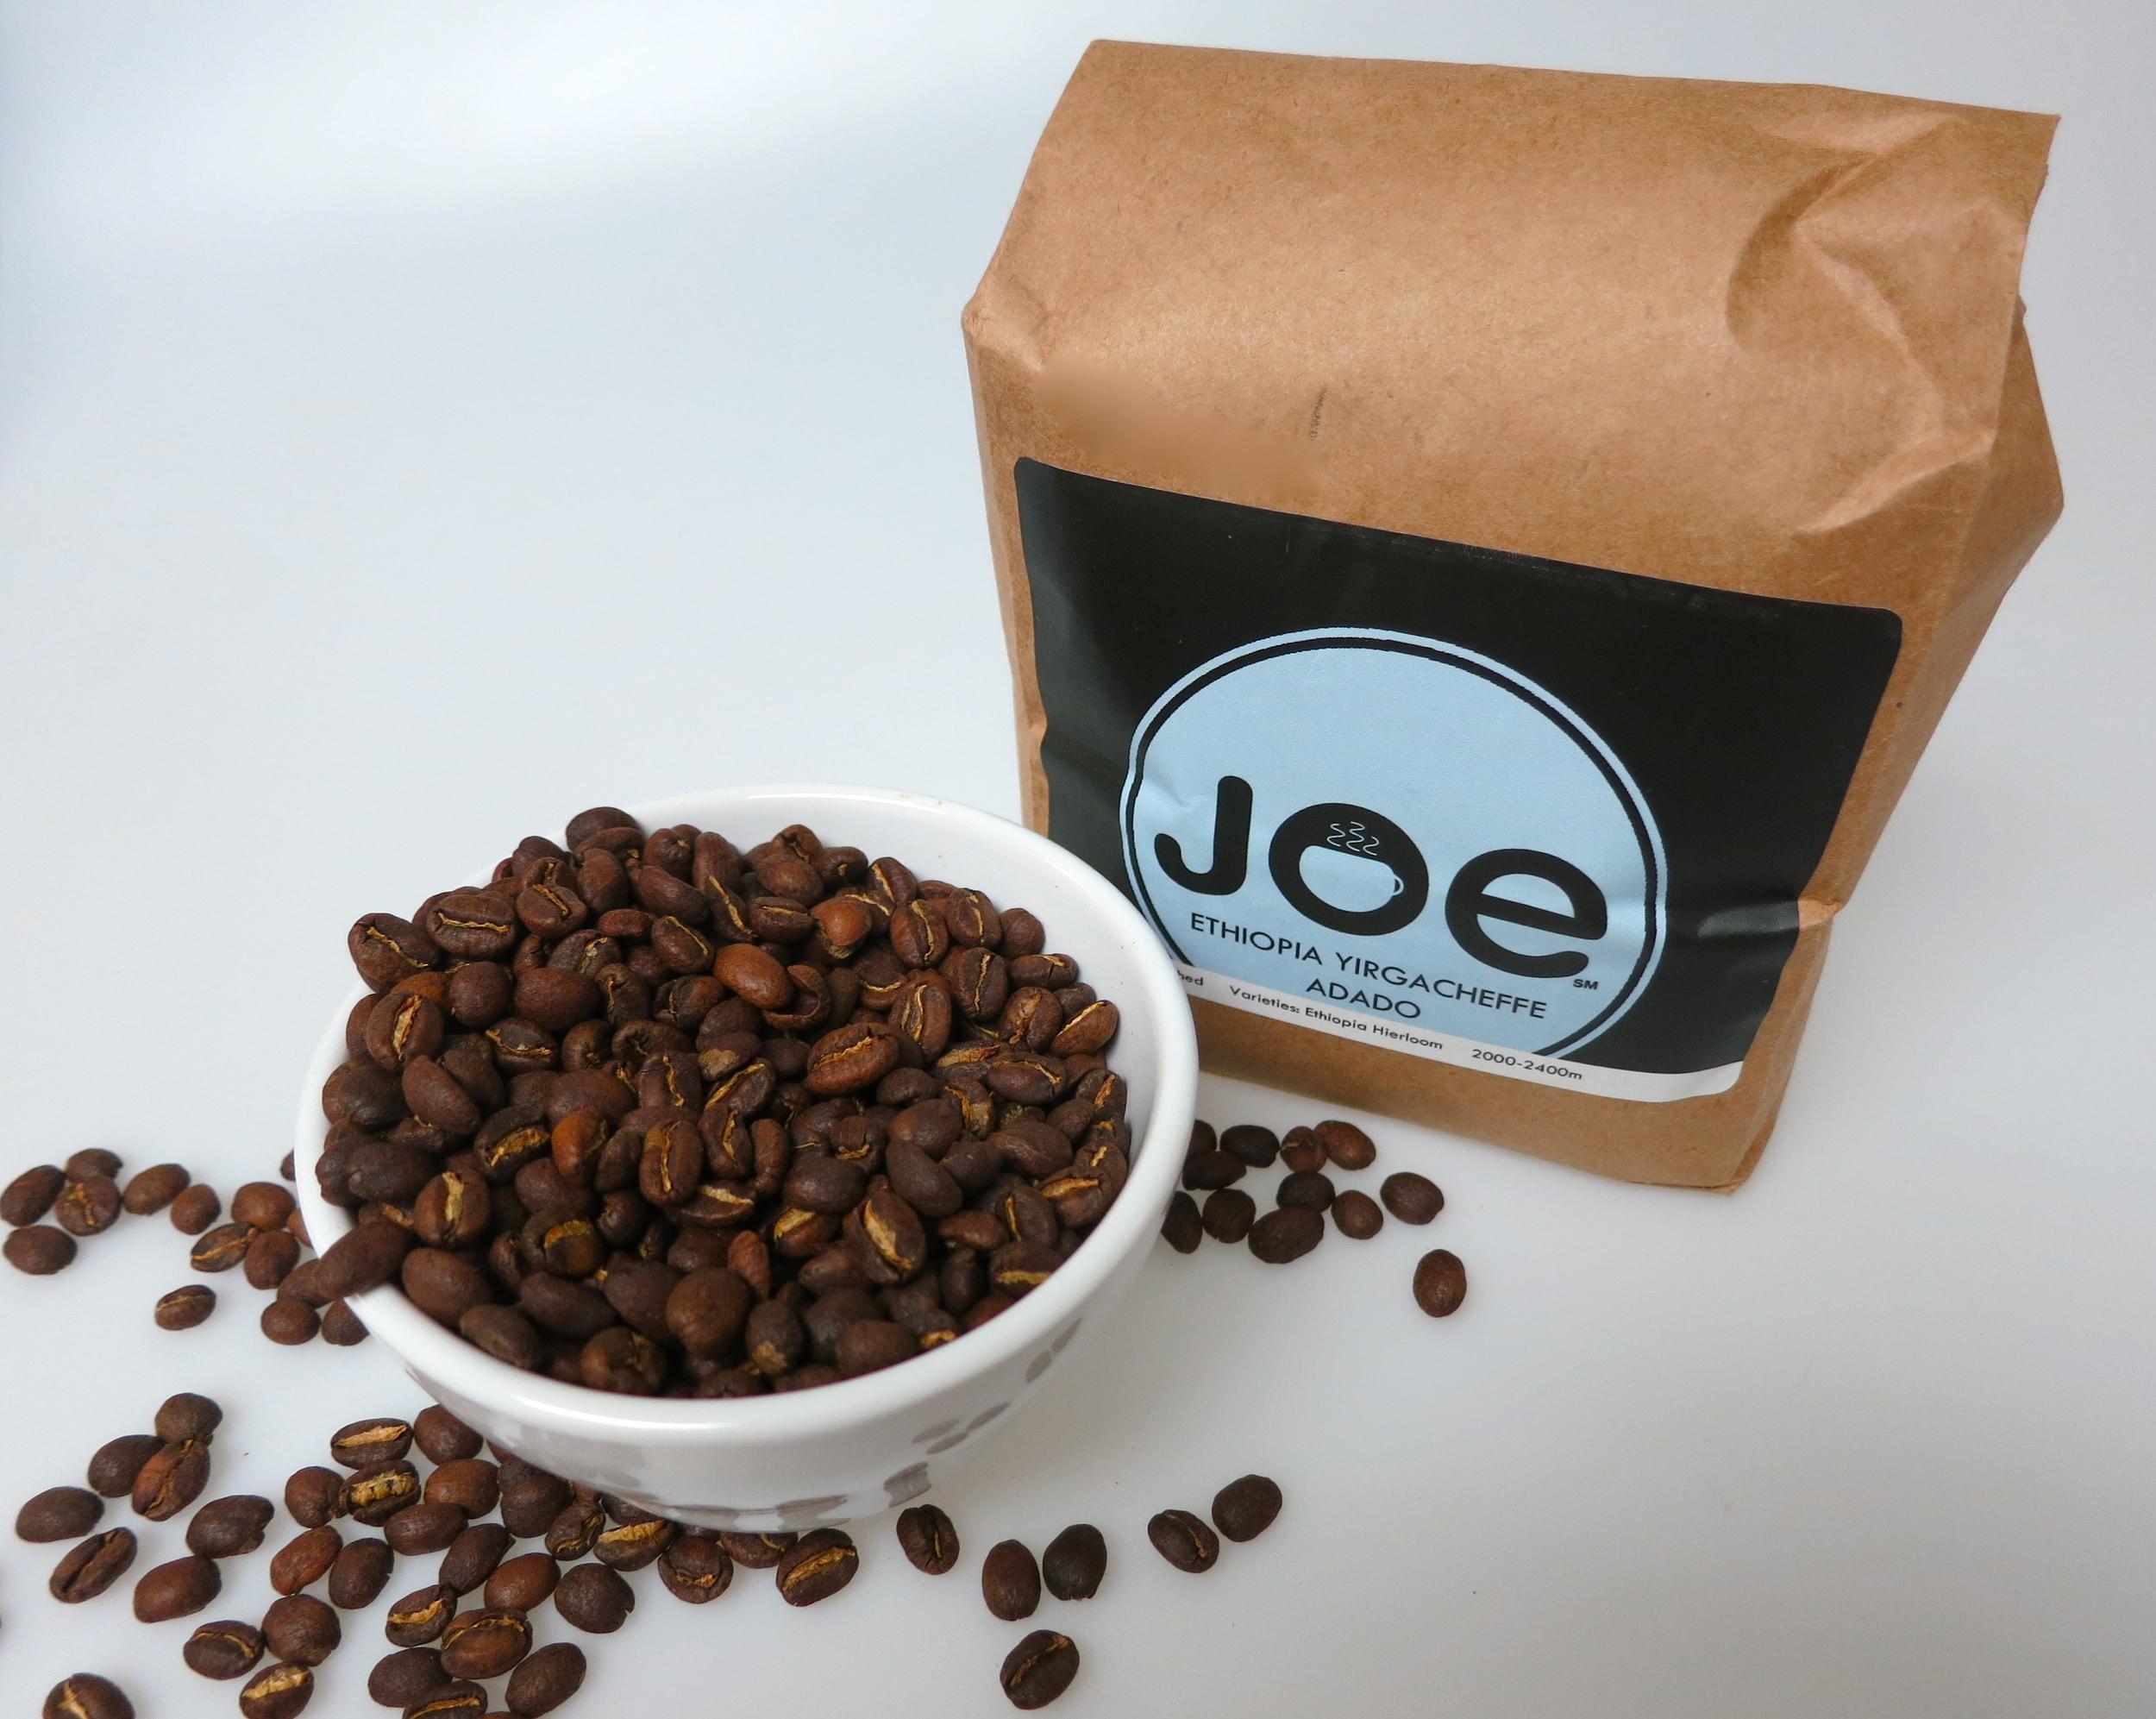 Joyride Coffee, Joe Yirgacheffe